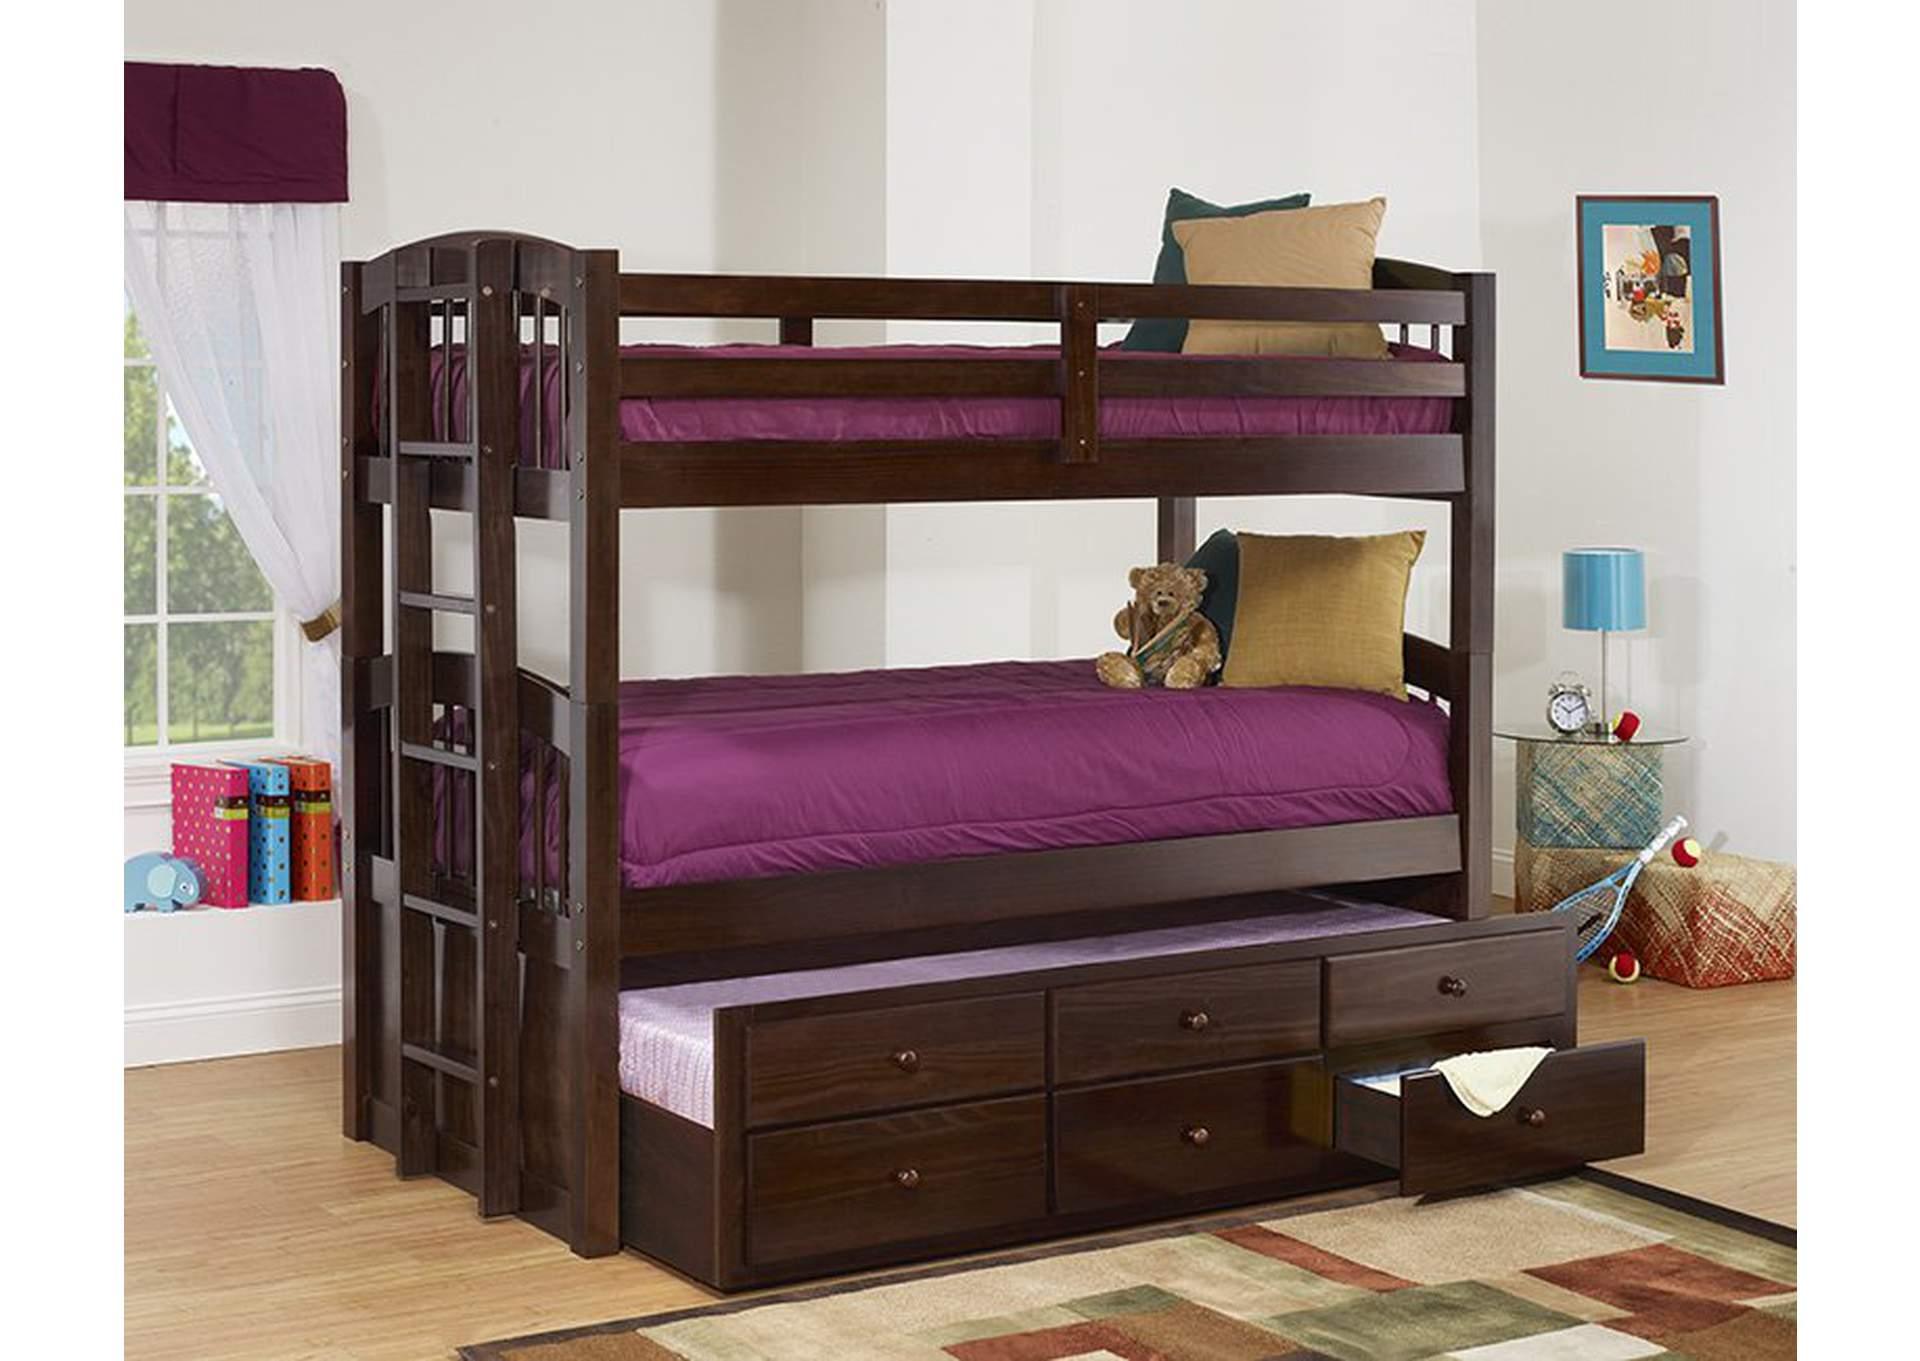 Java Triple Twin Bunk Bed,Furniture World Distributors